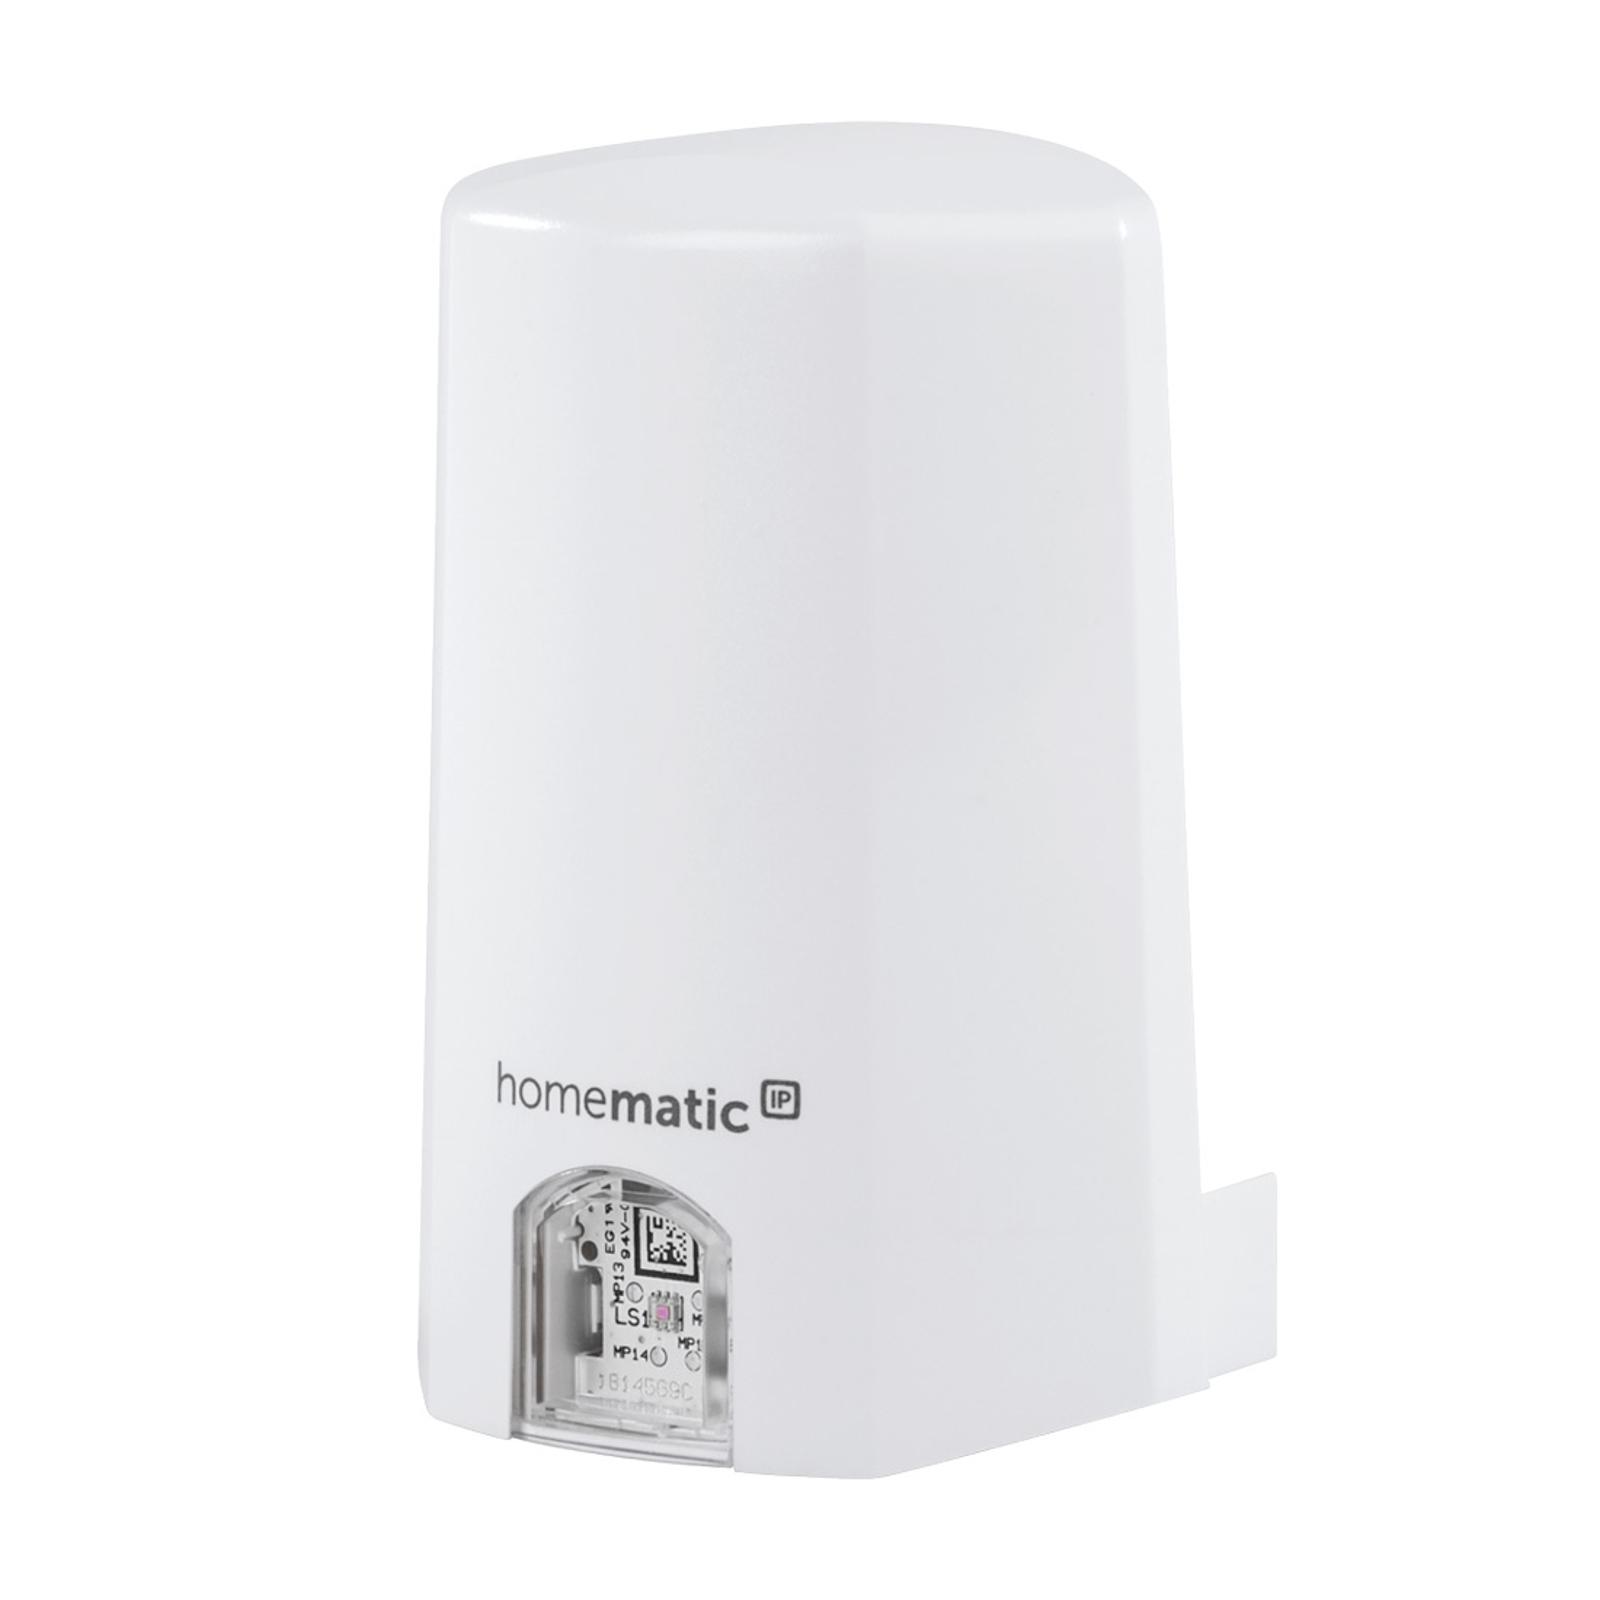 Homematic IP-lyssensor, beskyttet uteareal